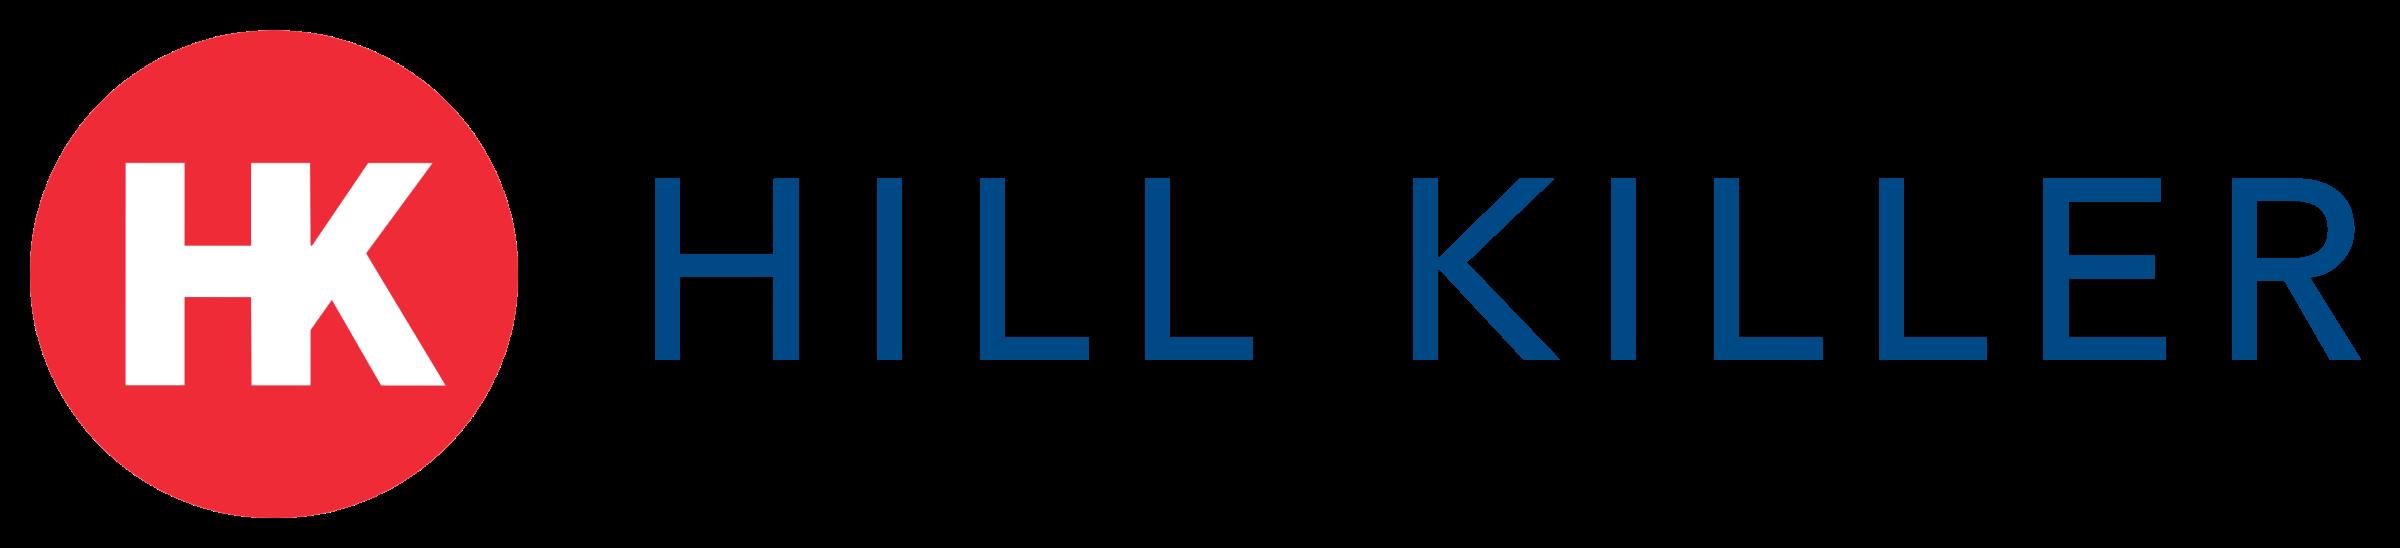 hill-killer-logo.png